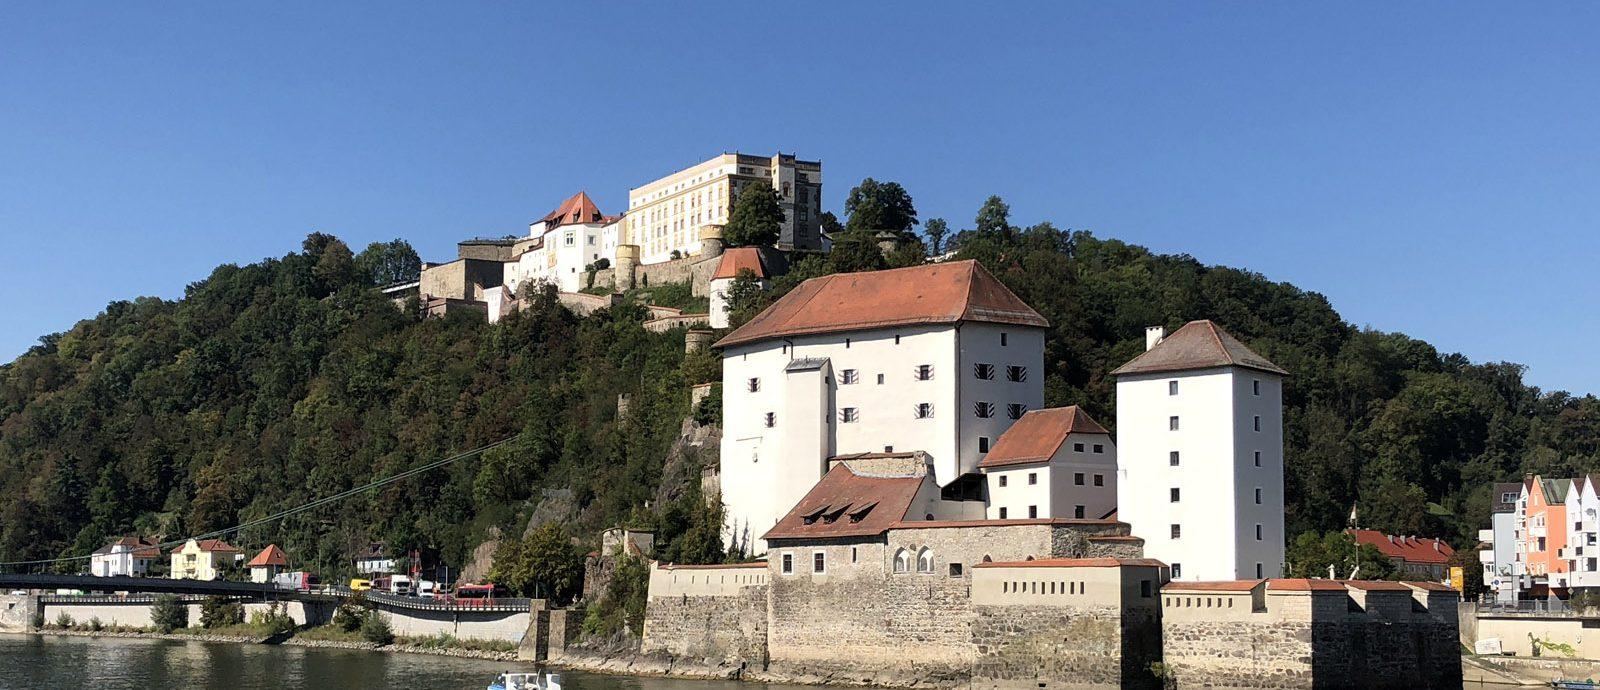 Campingurlaub - Veste Oberhaus Passau